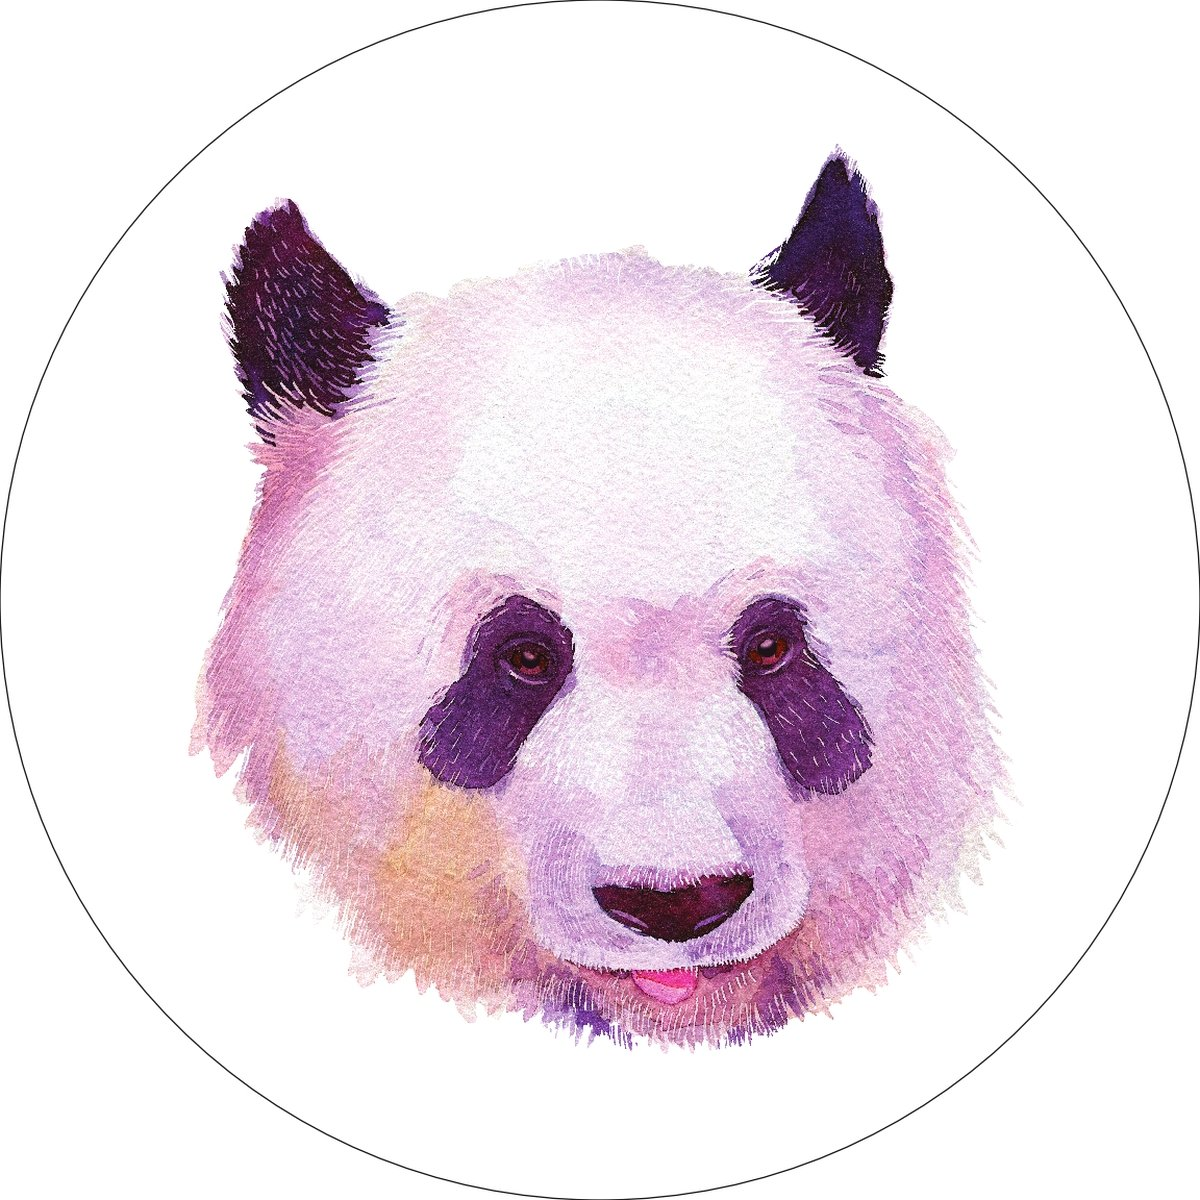 Panda Home Wall Shelf Decor Animal Decorations Watercolor Round Sign - 12 Inch, Metal